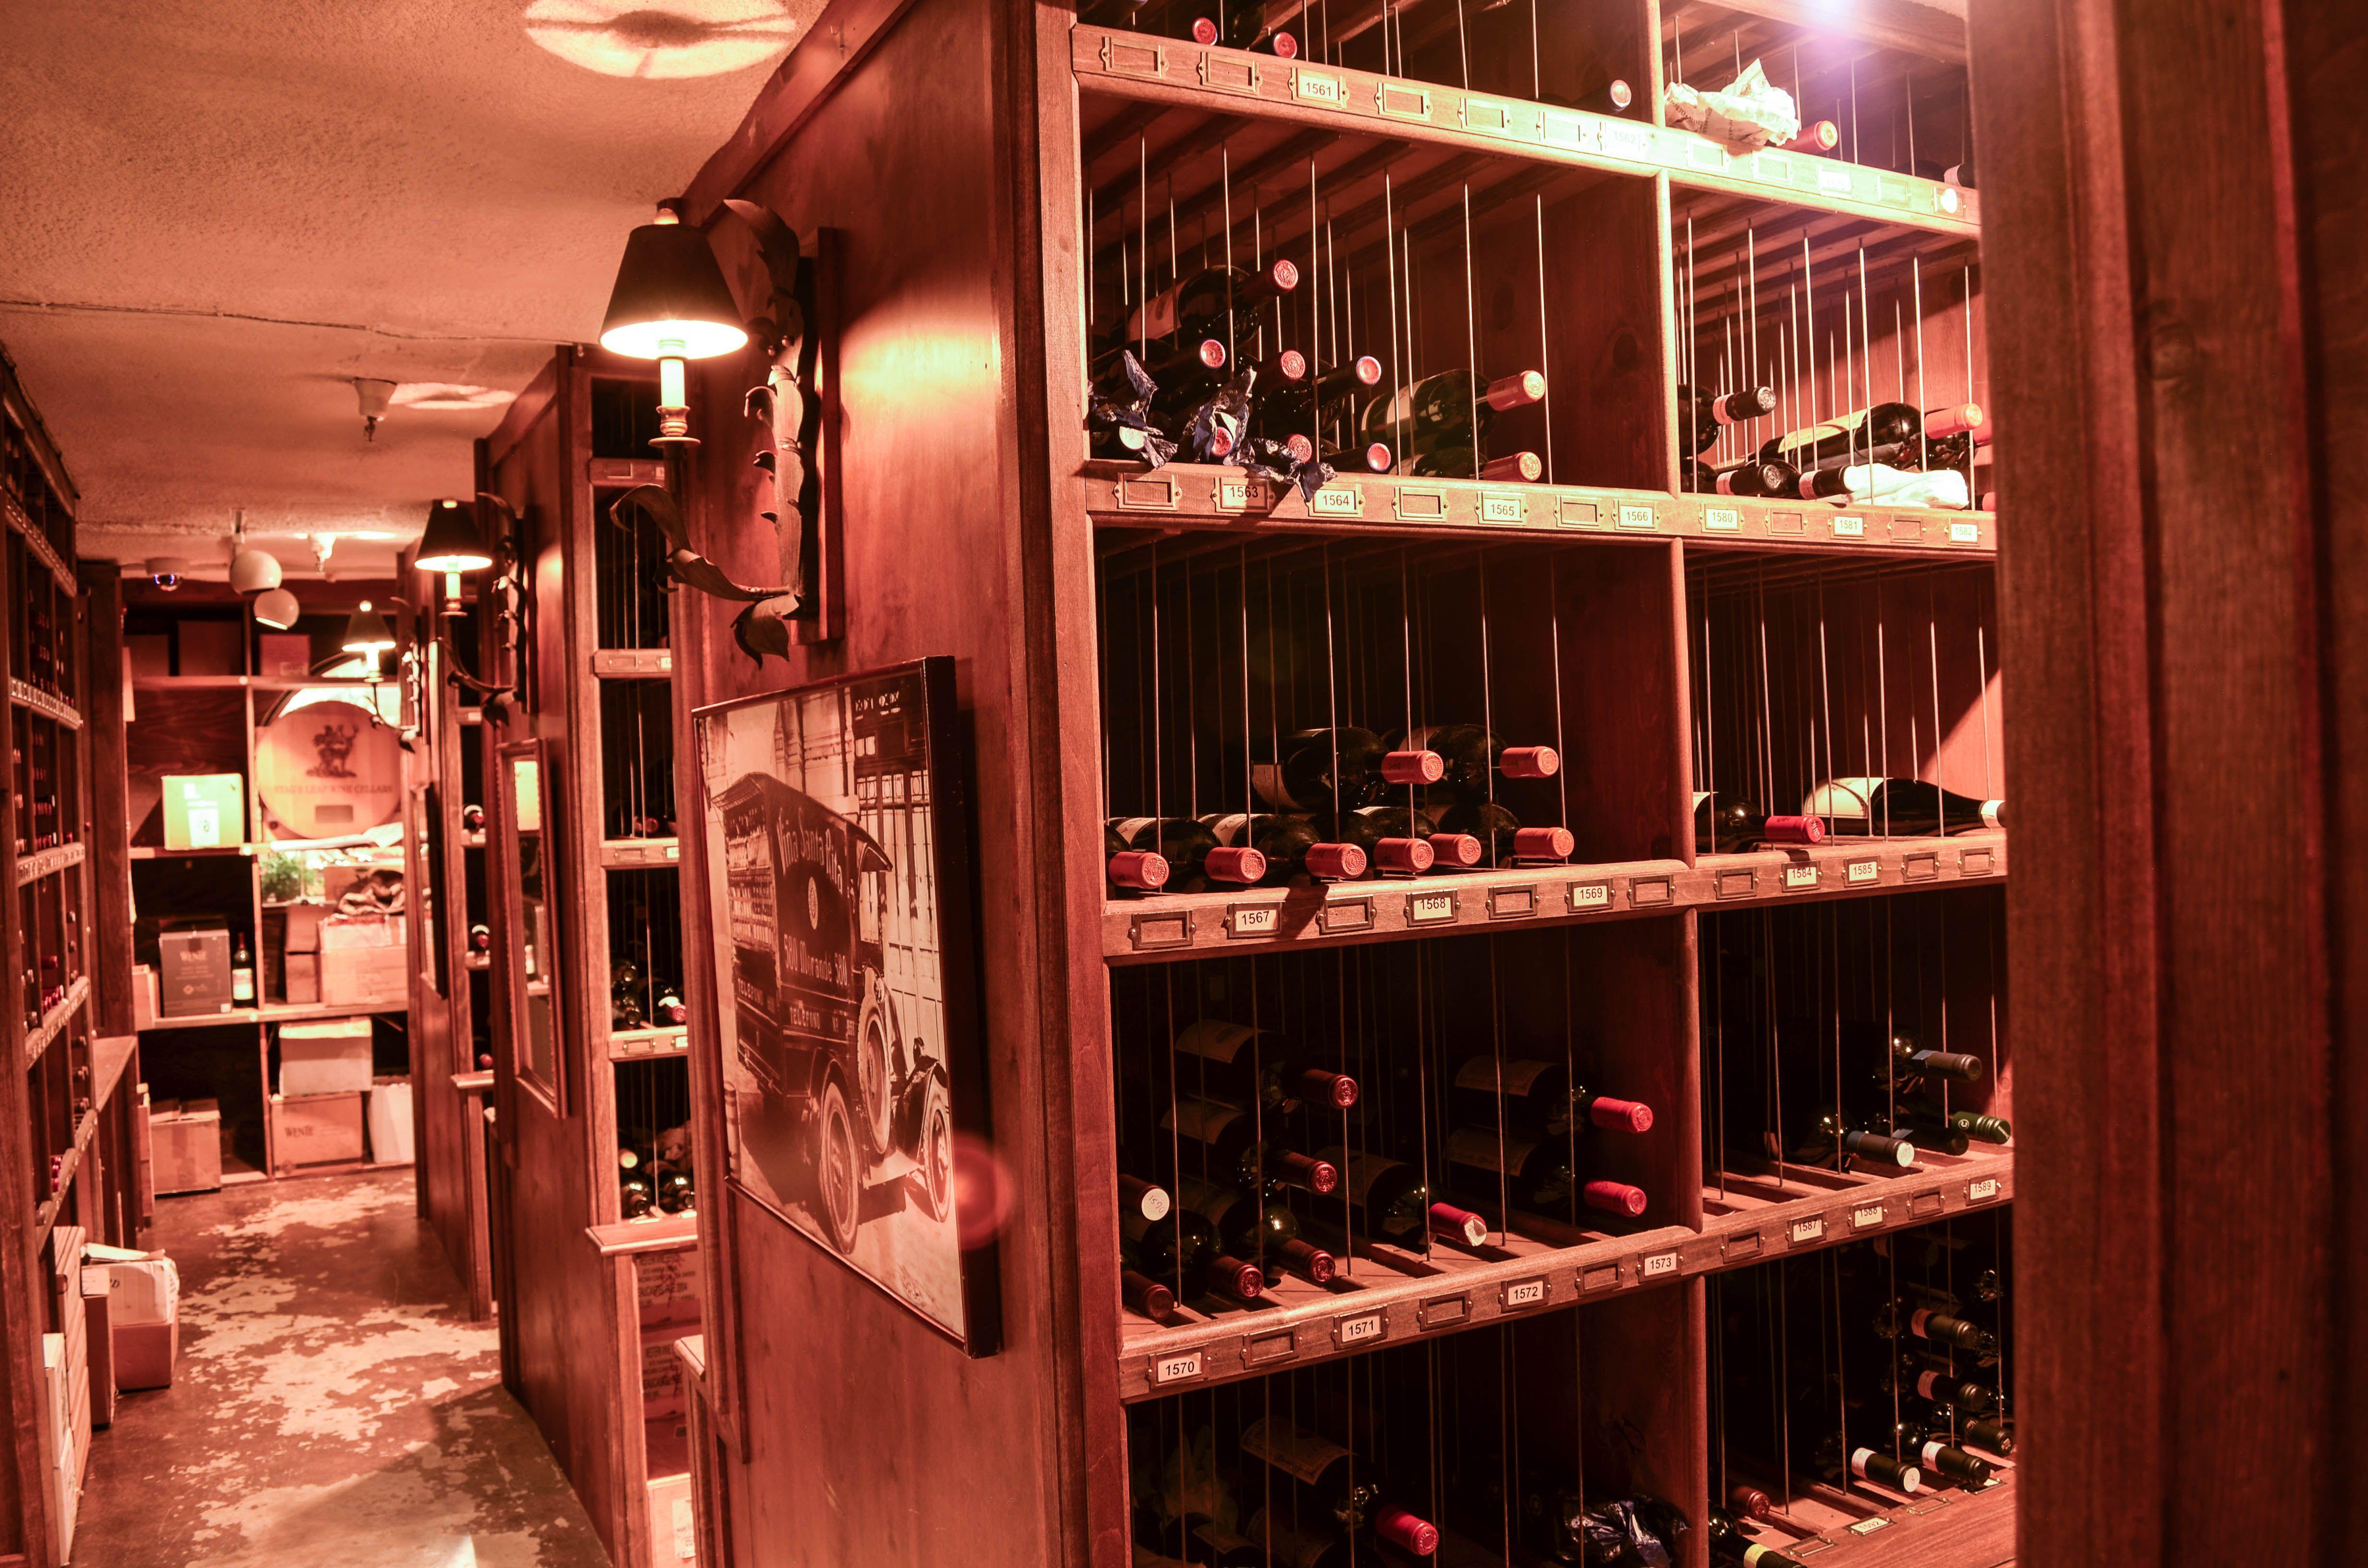 Pin By Angus Barn On Angus Barn Wine Cellar Wine Rack Wine Cellar Decor